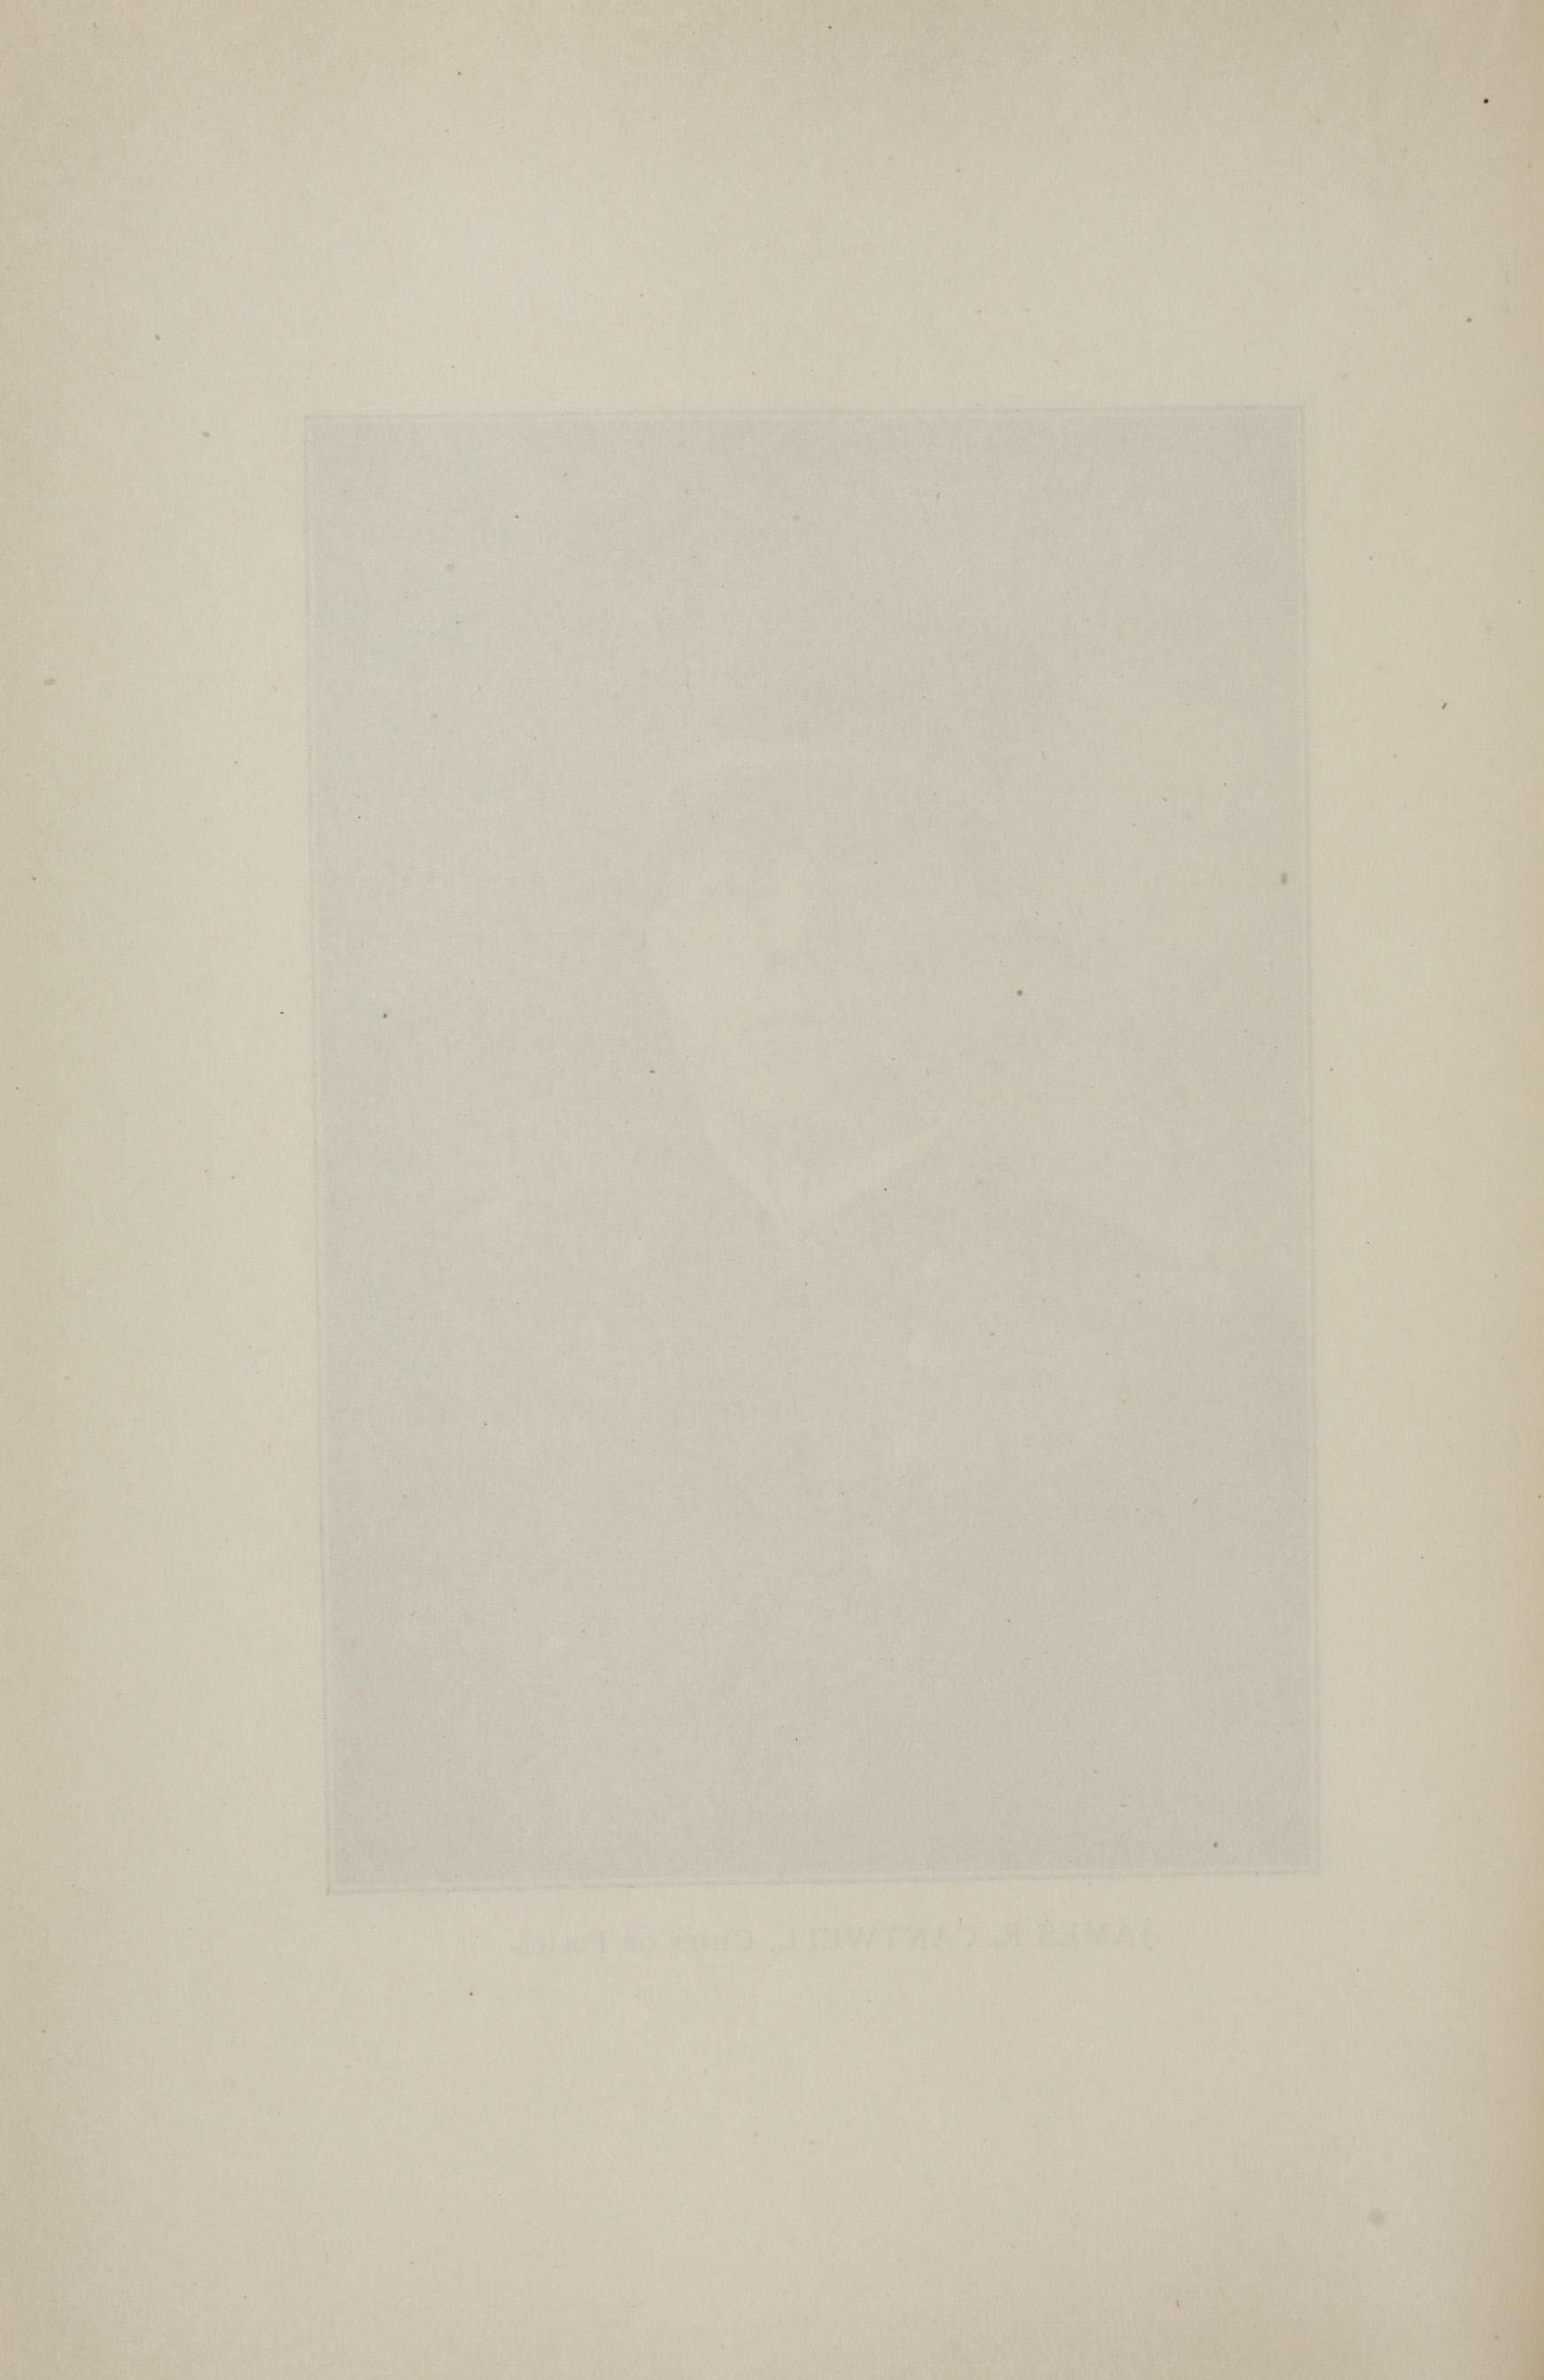 Charleston Yearbook, 1921, page 282